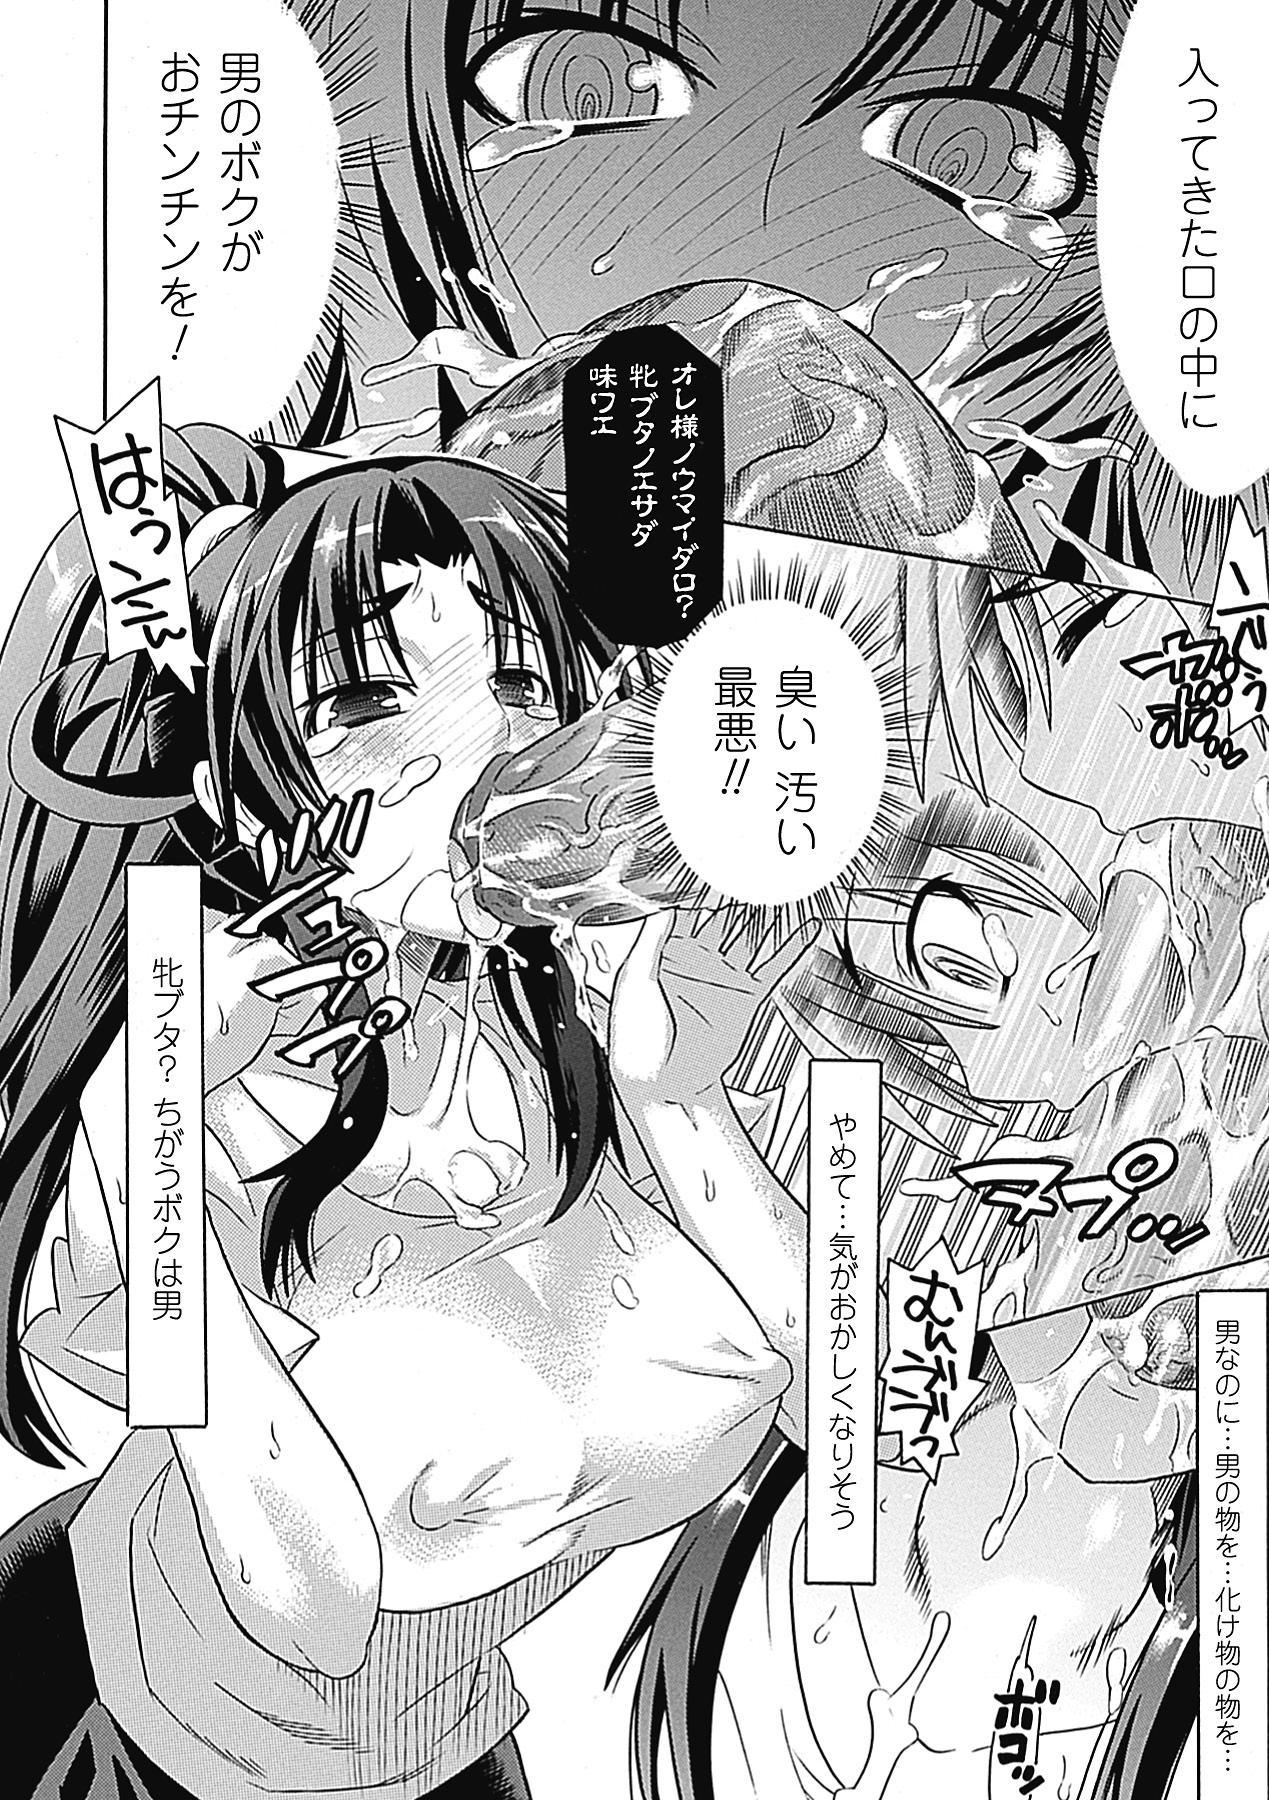 Megami Crisis 1 64